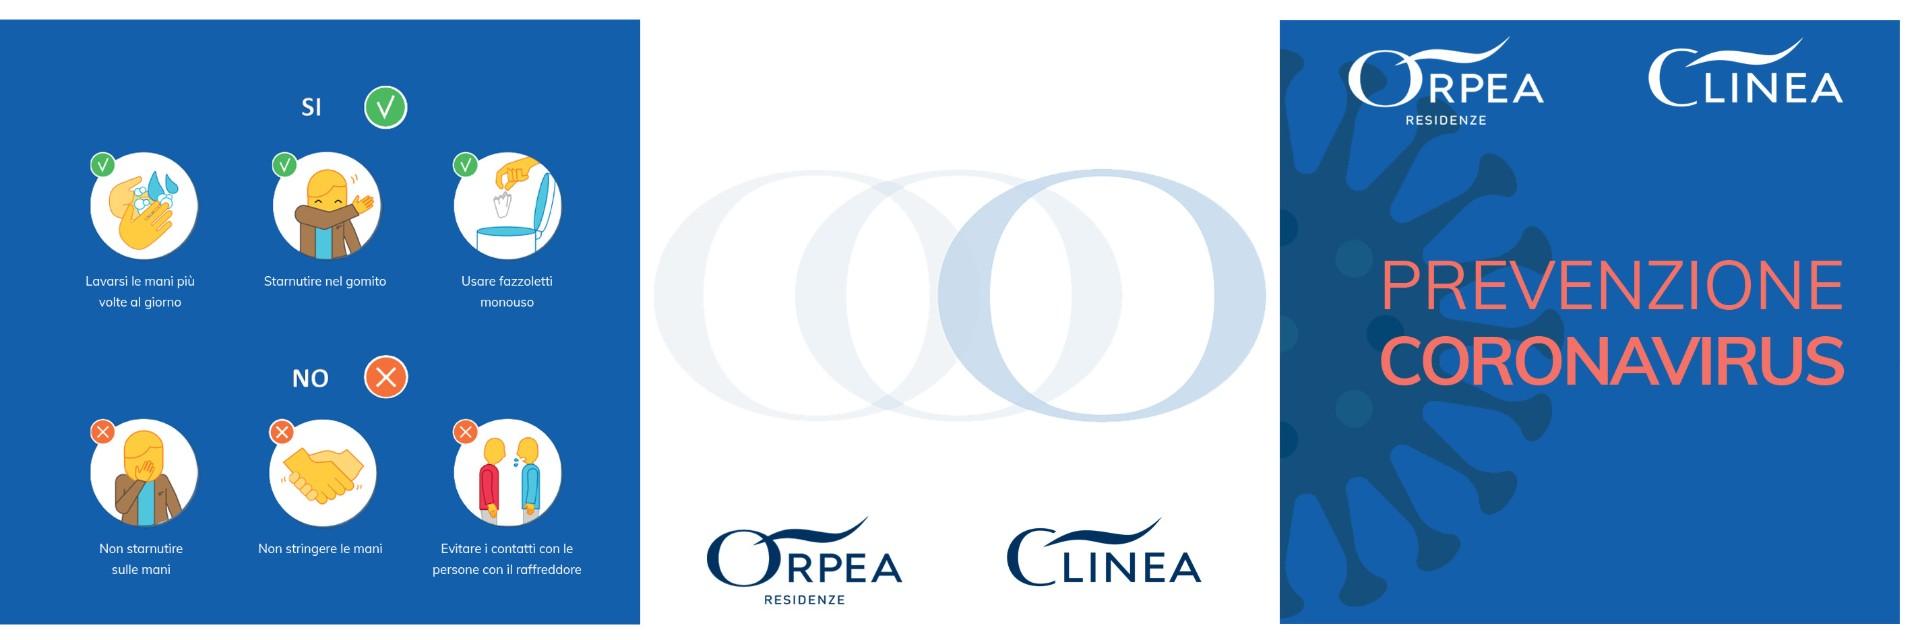 Orpea - Sicurezza Coronavirus